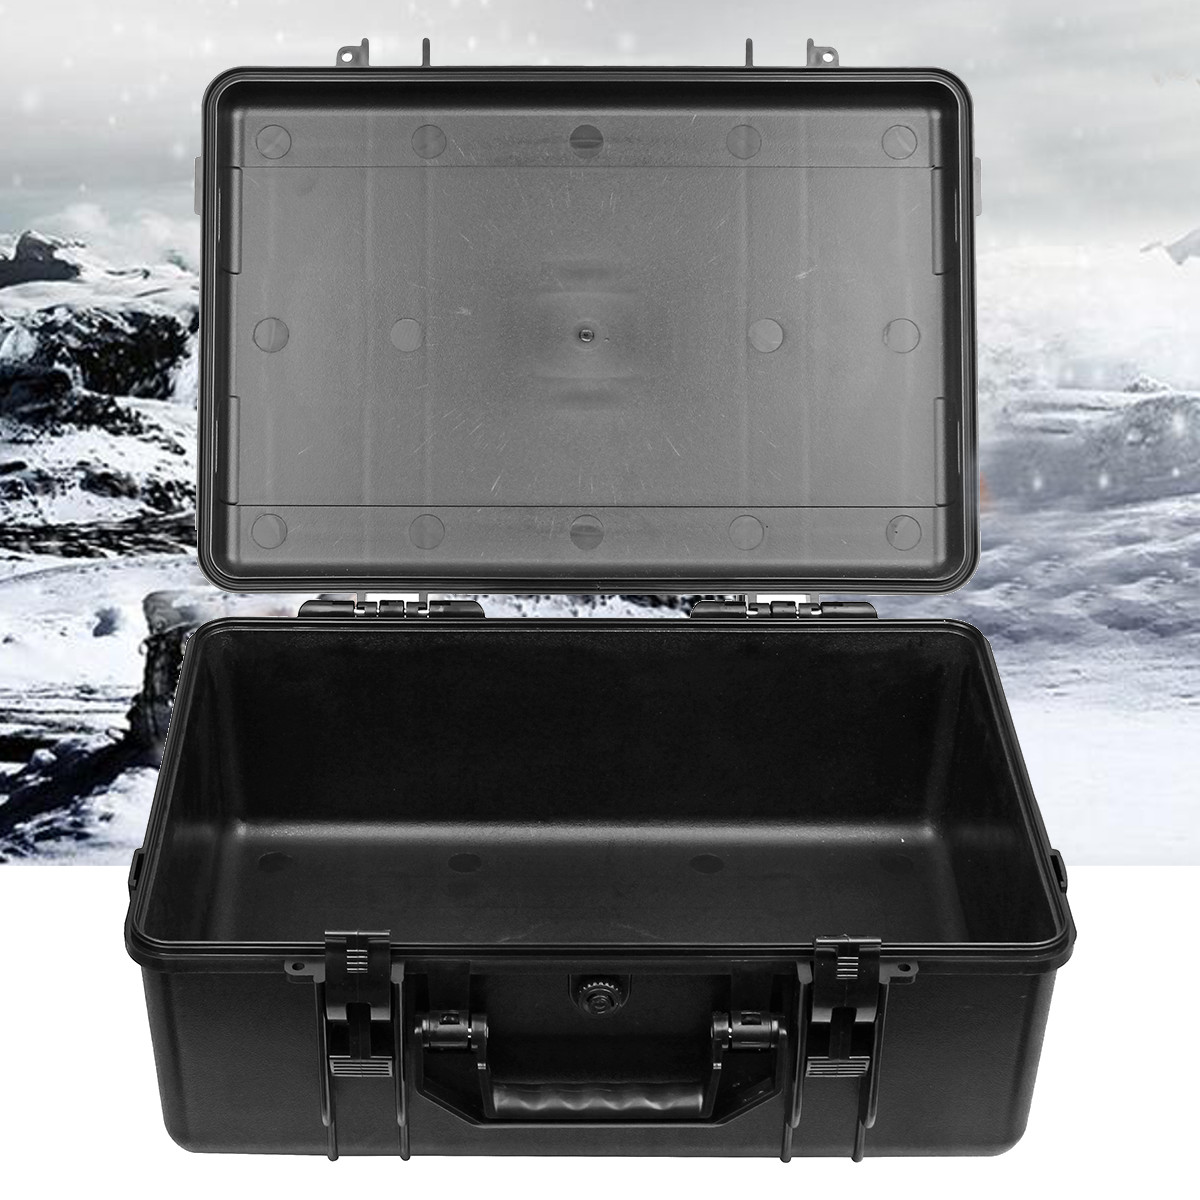 Black Hard Shell Carry Case Bag Waterproof Camera Equipment Protective Storage Box Shockproof Instruments Tools Box Organizer